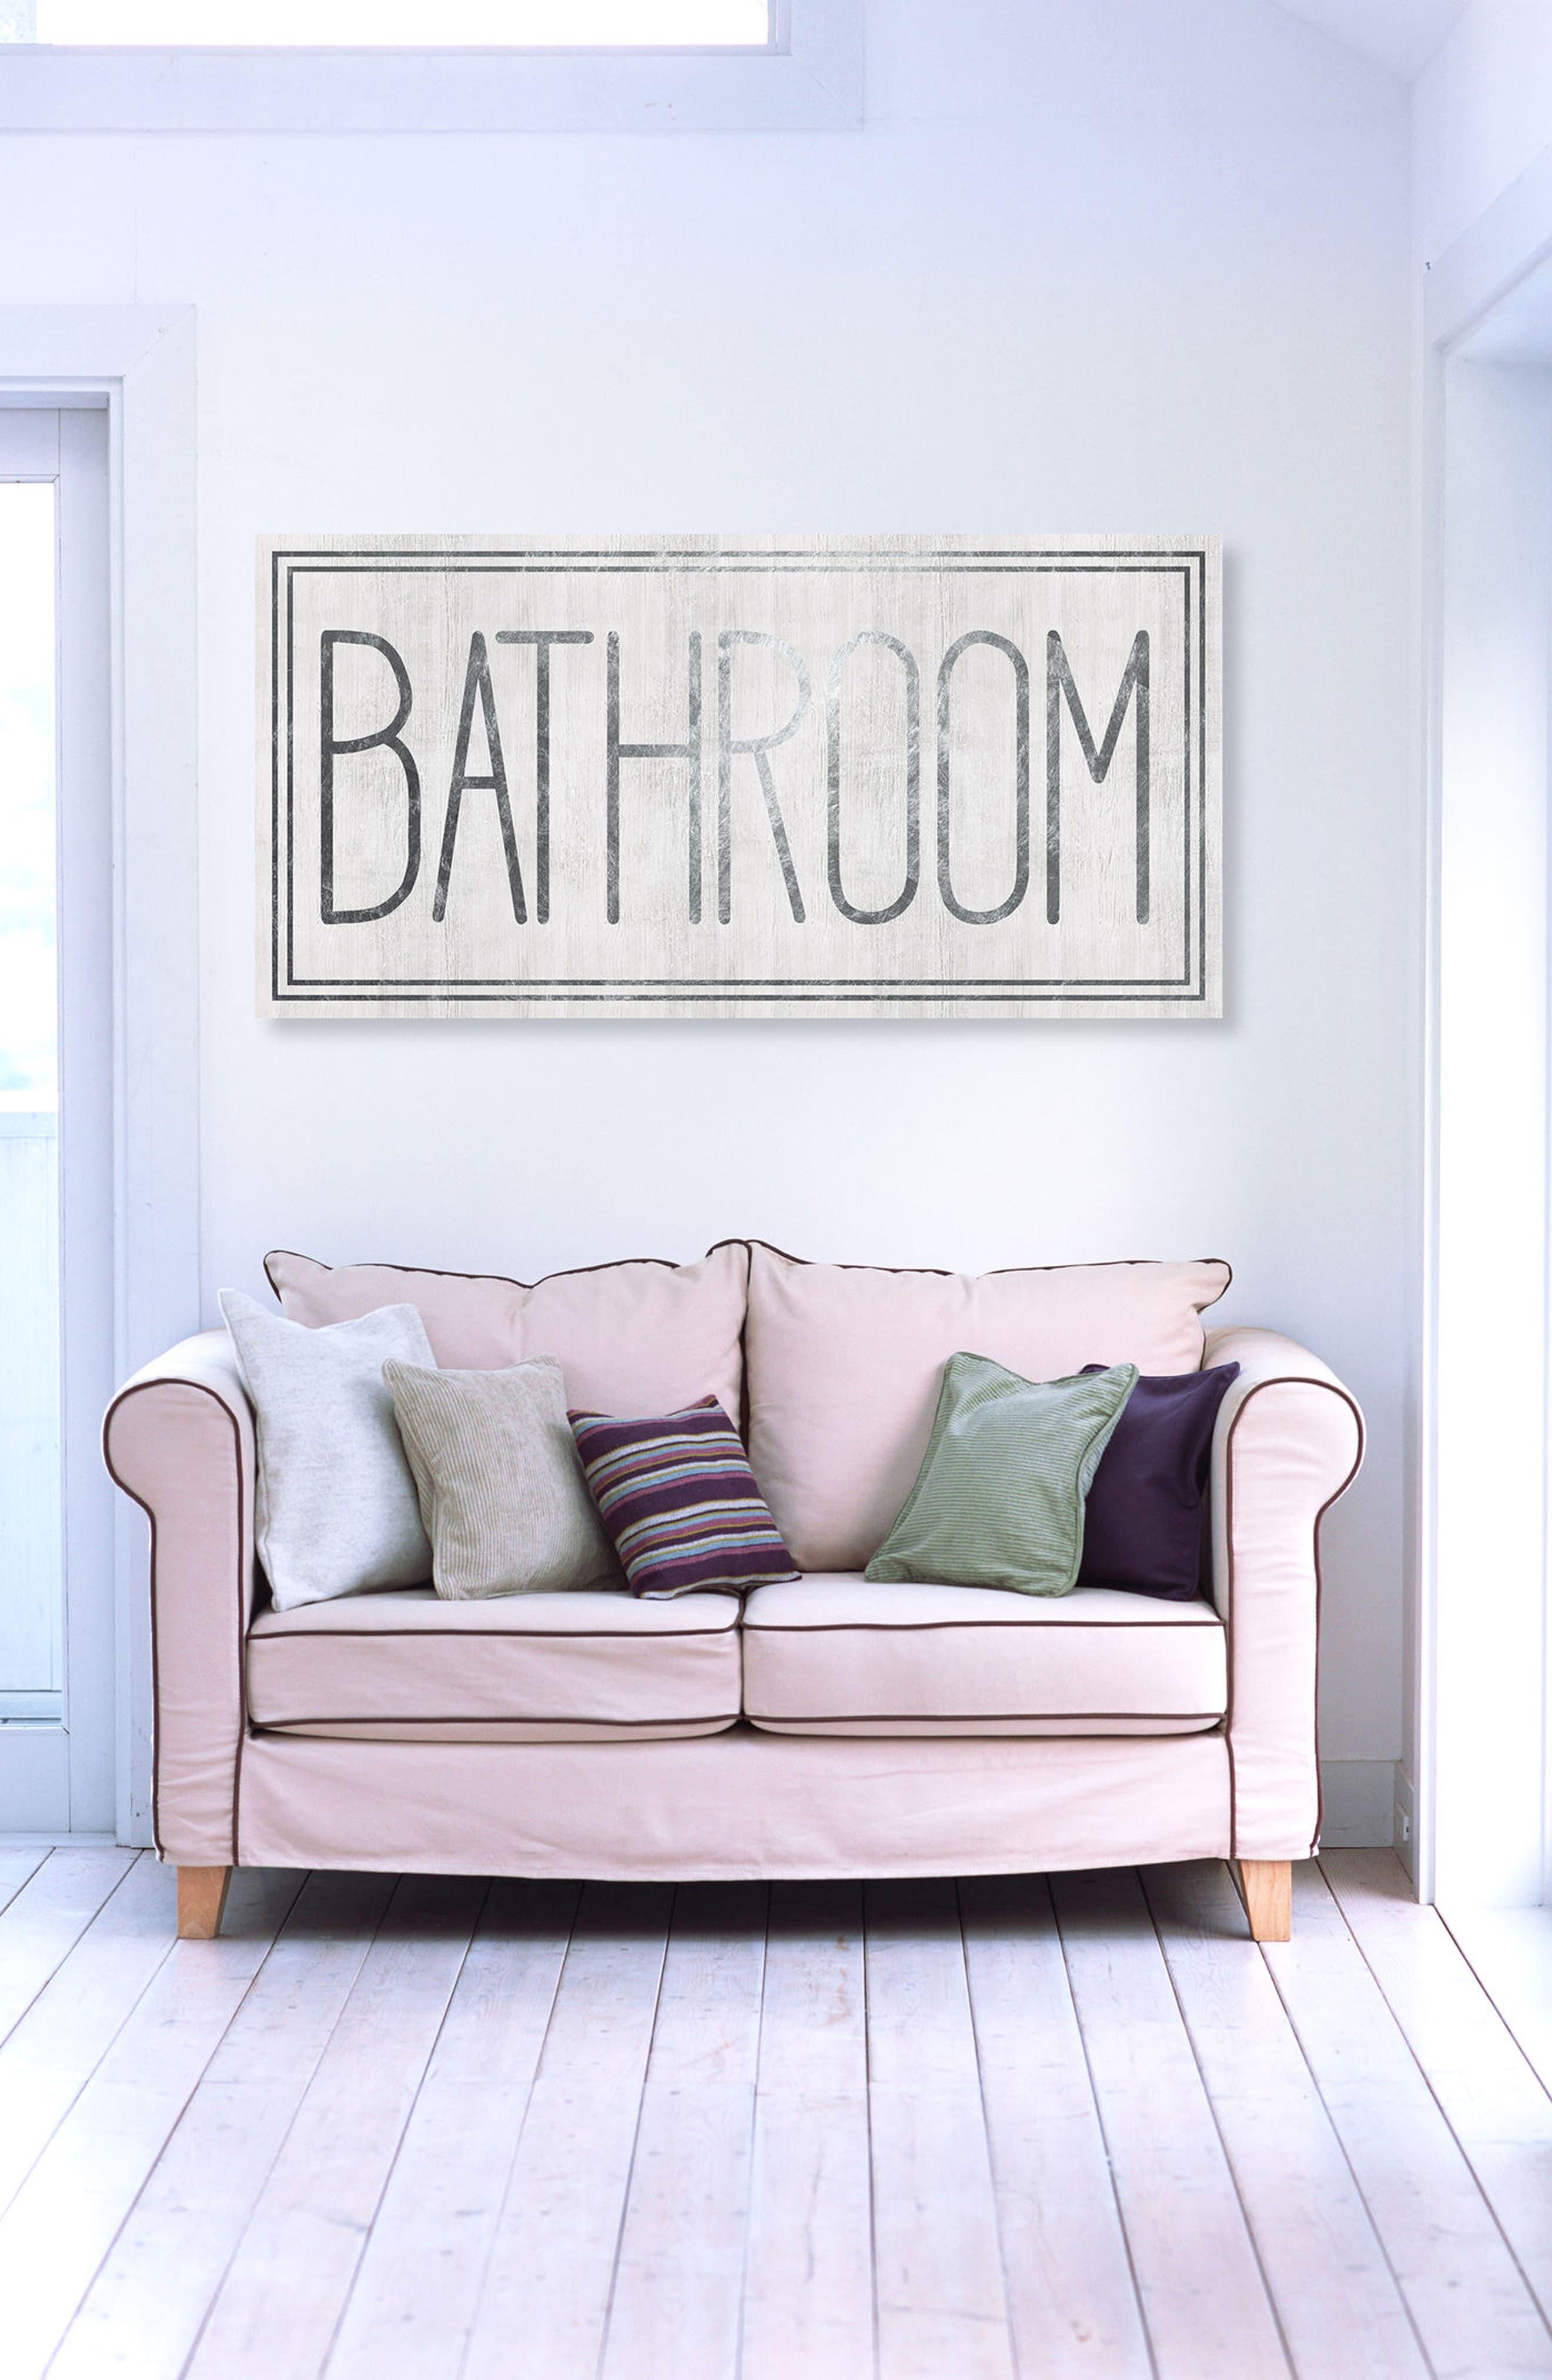 Bathroom Canvas Wall Art,                             Alternate thumbnail 2, color,                             100